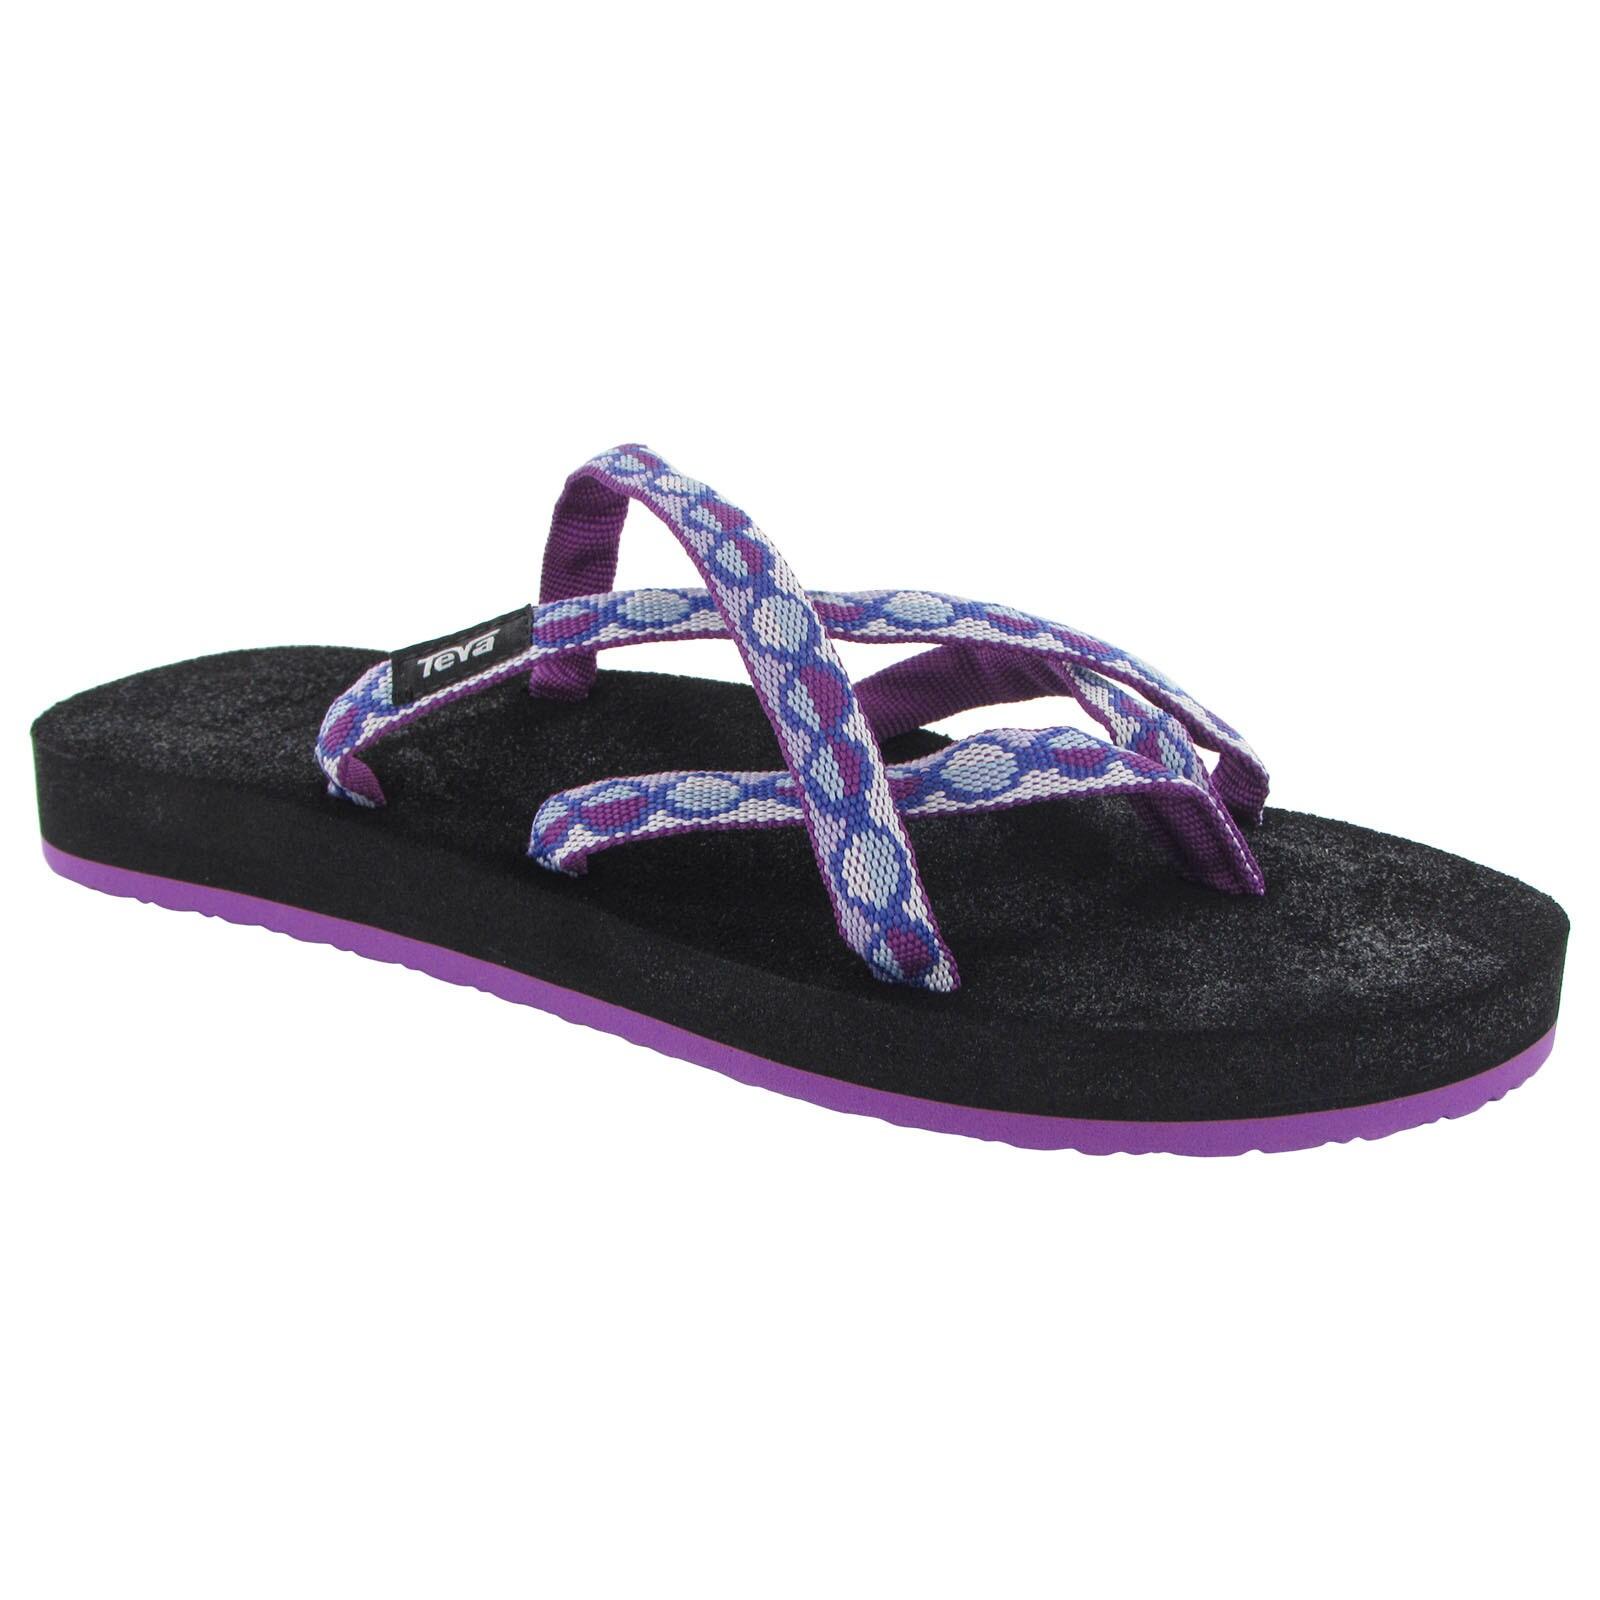 d1ba533877cfbc Shop Teva Womens Olowahu Flip Flop Sandals - Free Shipping On Orders ...